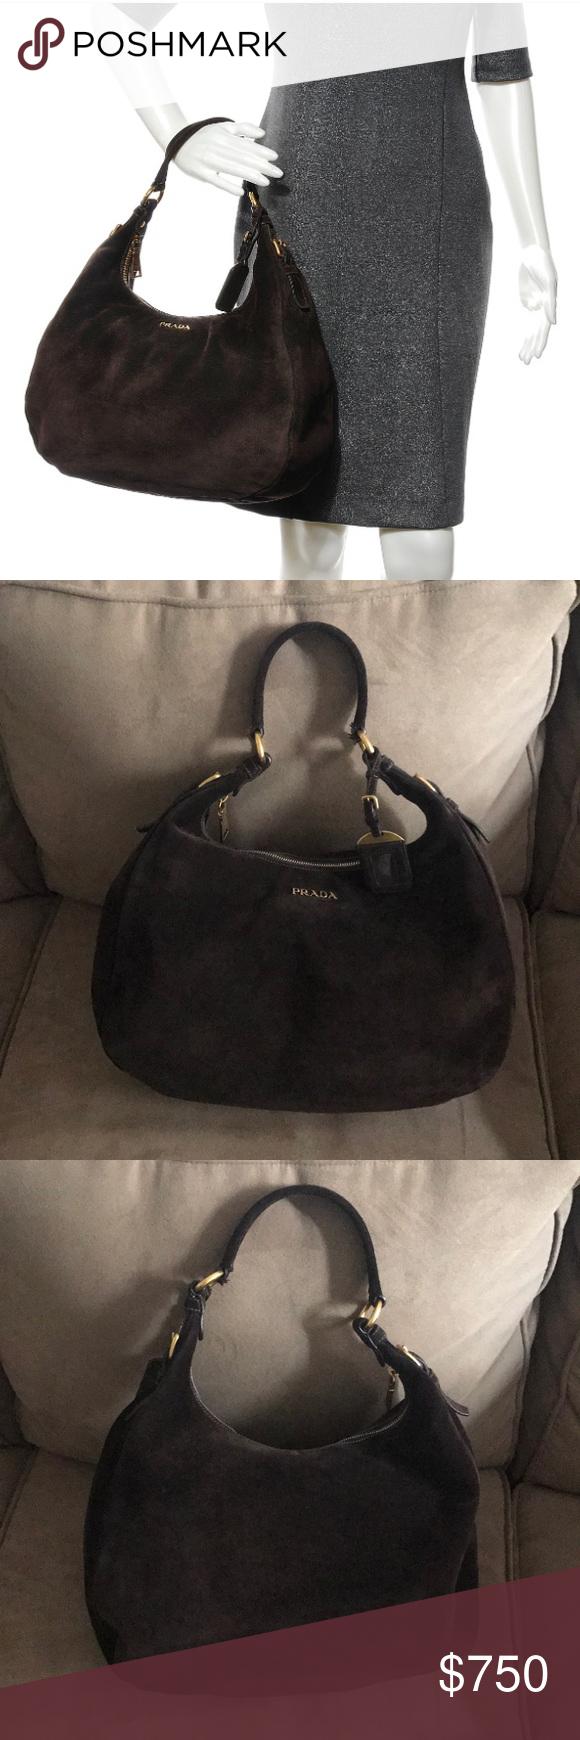 Prada Brown Suede Hobo Bag Authentic brown suede Prada hobo handbag. This  is a beautiful d4514a05a6